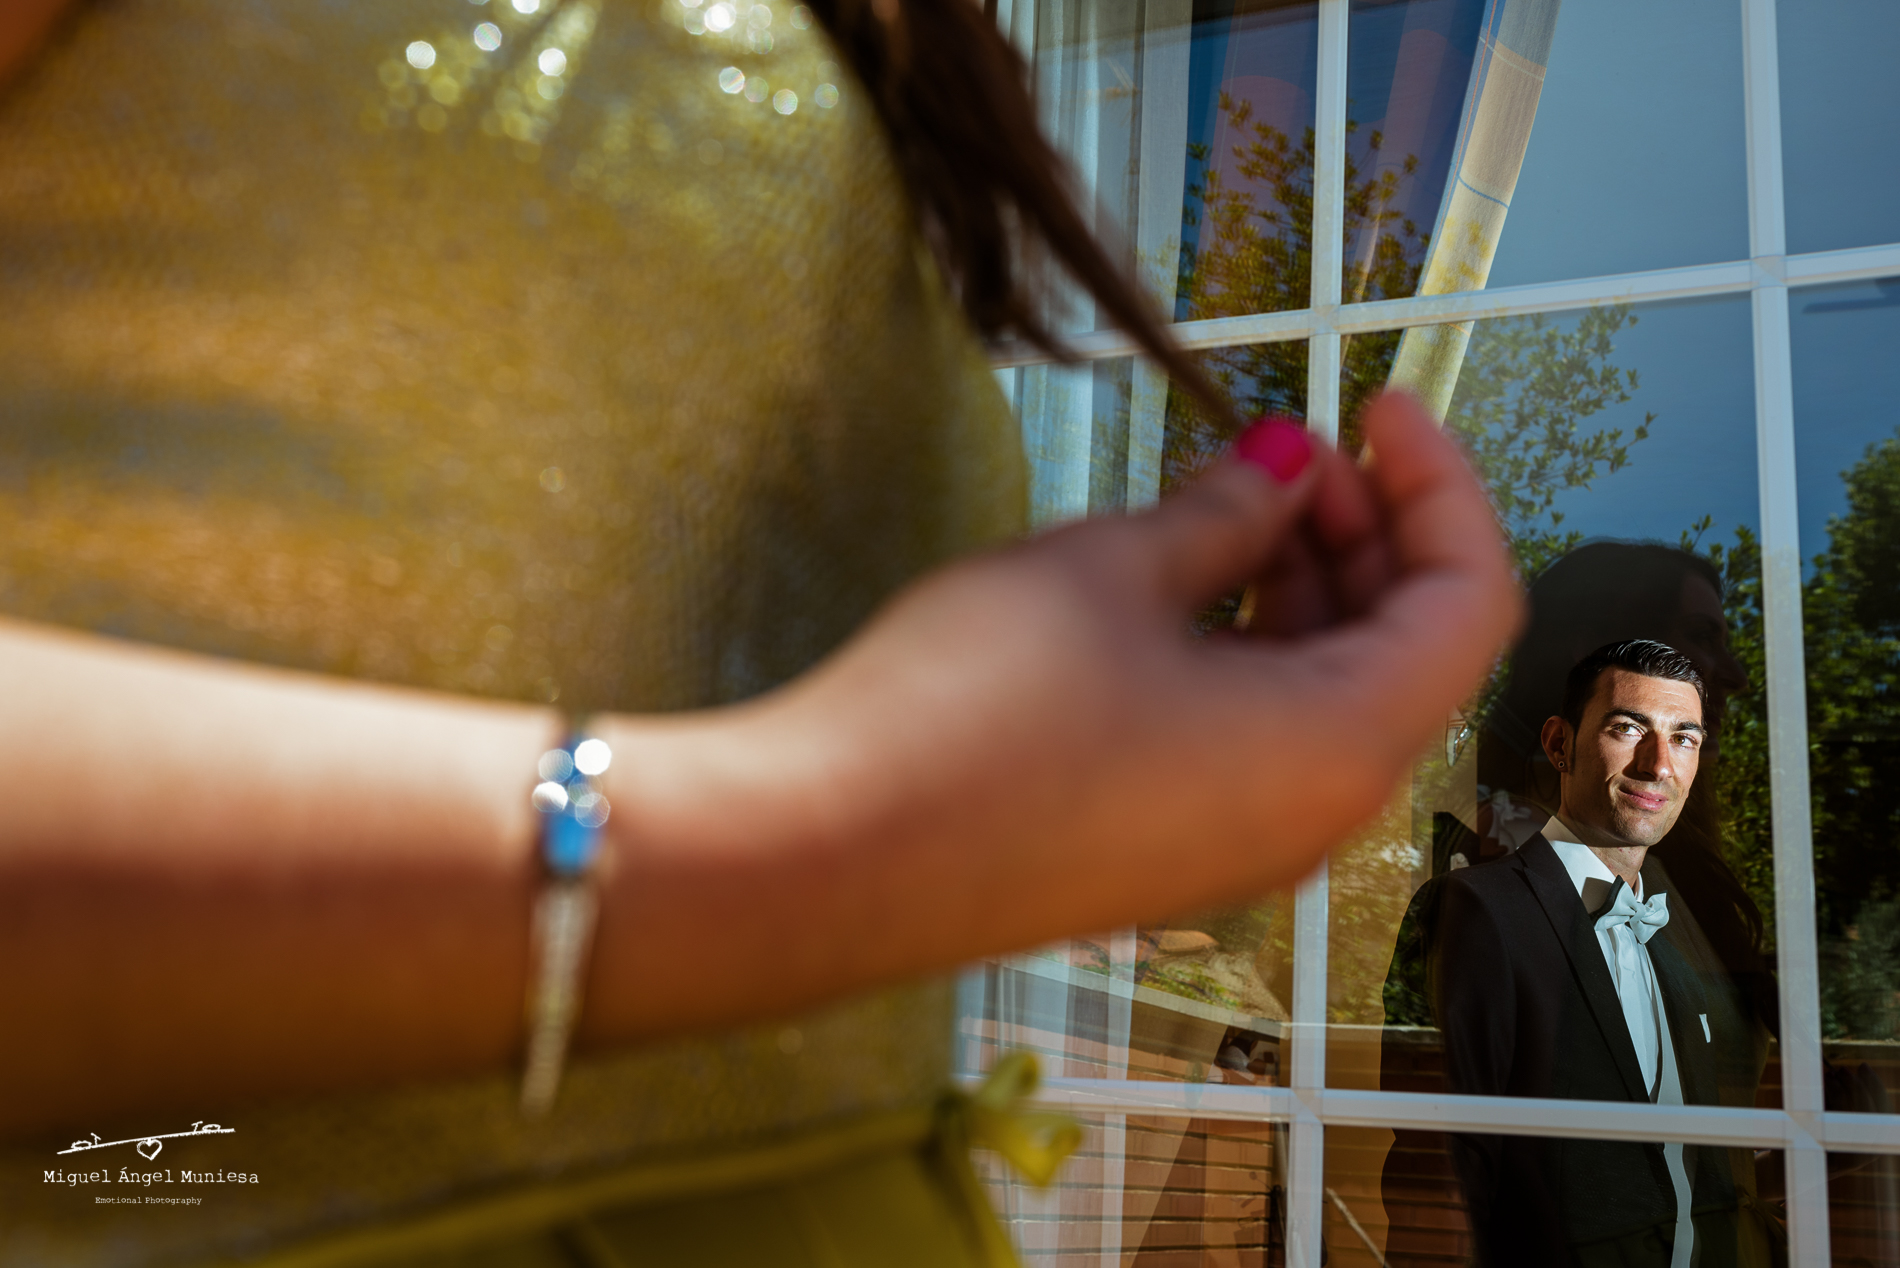 boda, fotografia de boda, boda zaragoza, fotografia, wedding, wedding photography, miguel angel muniesa, fotografo boda Zaragoza, fotografo boda, destination wedding_ 017